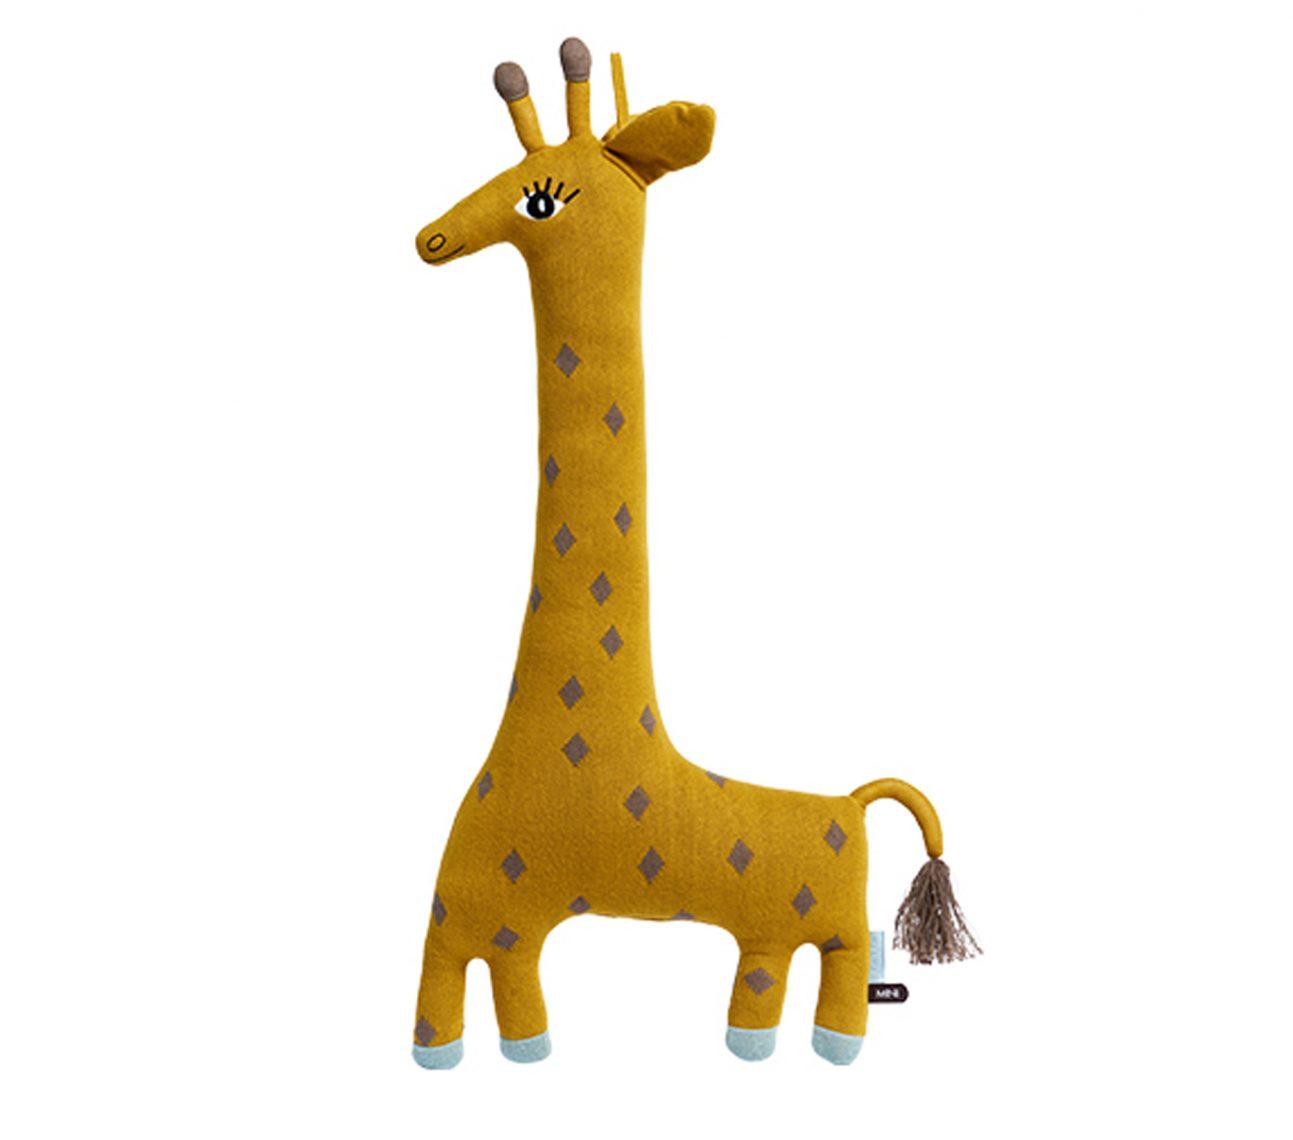 Kudde formad som giraff – OYOY – Noah the giraff